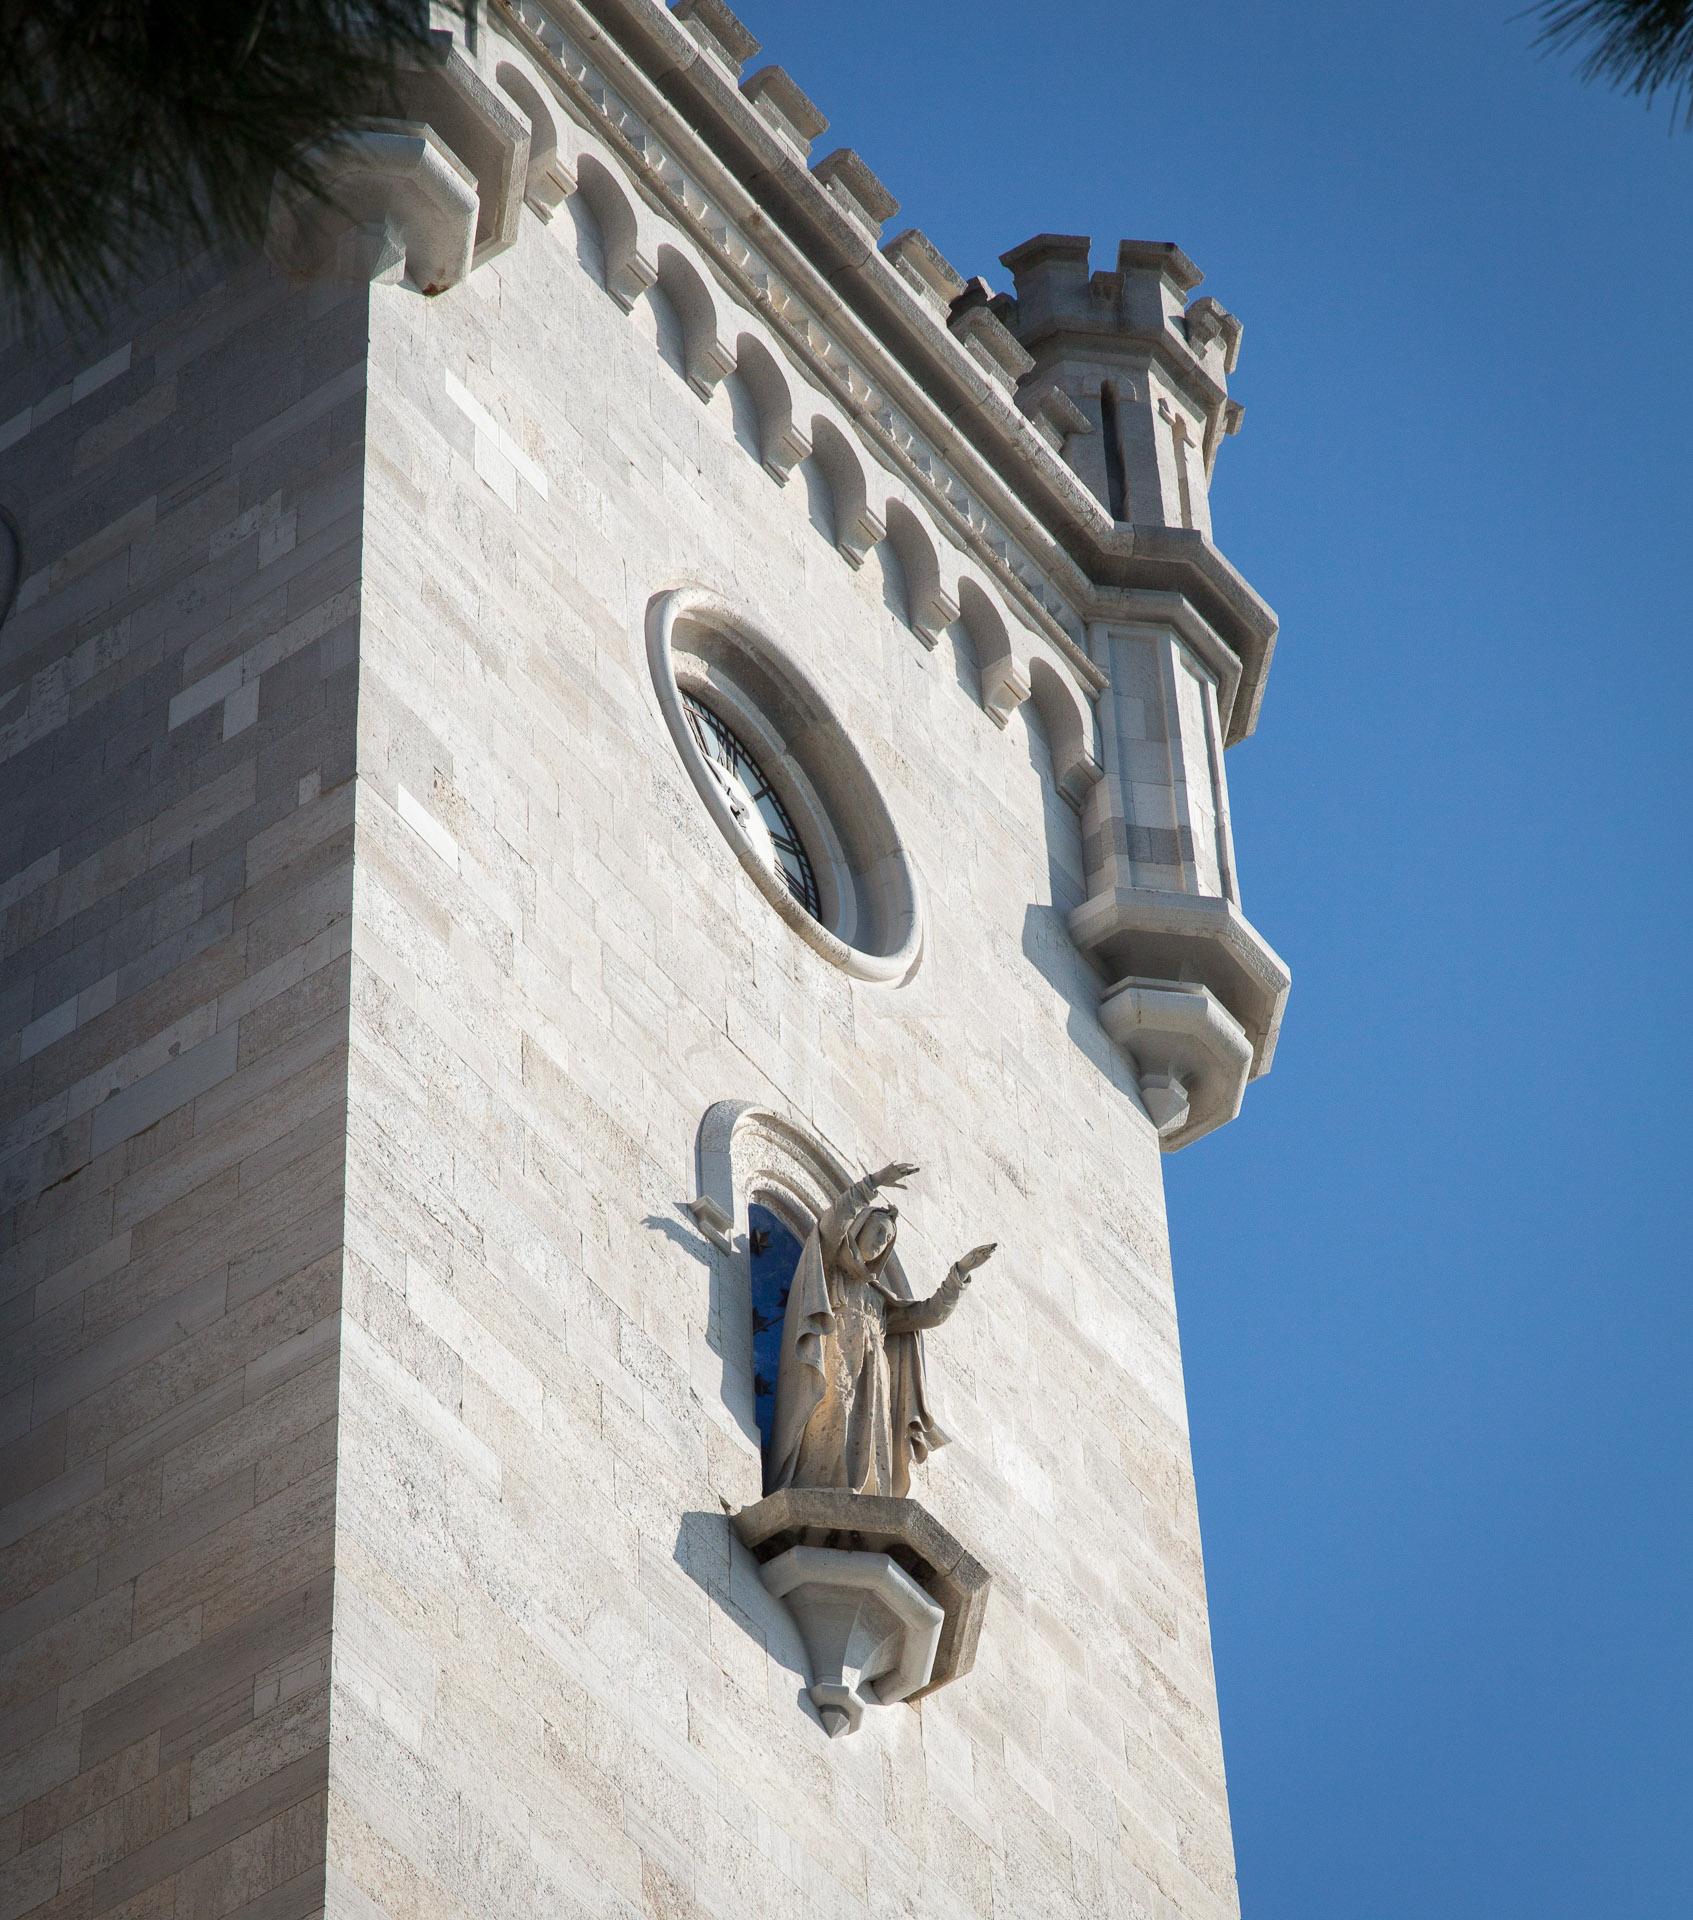 Statue am Turm